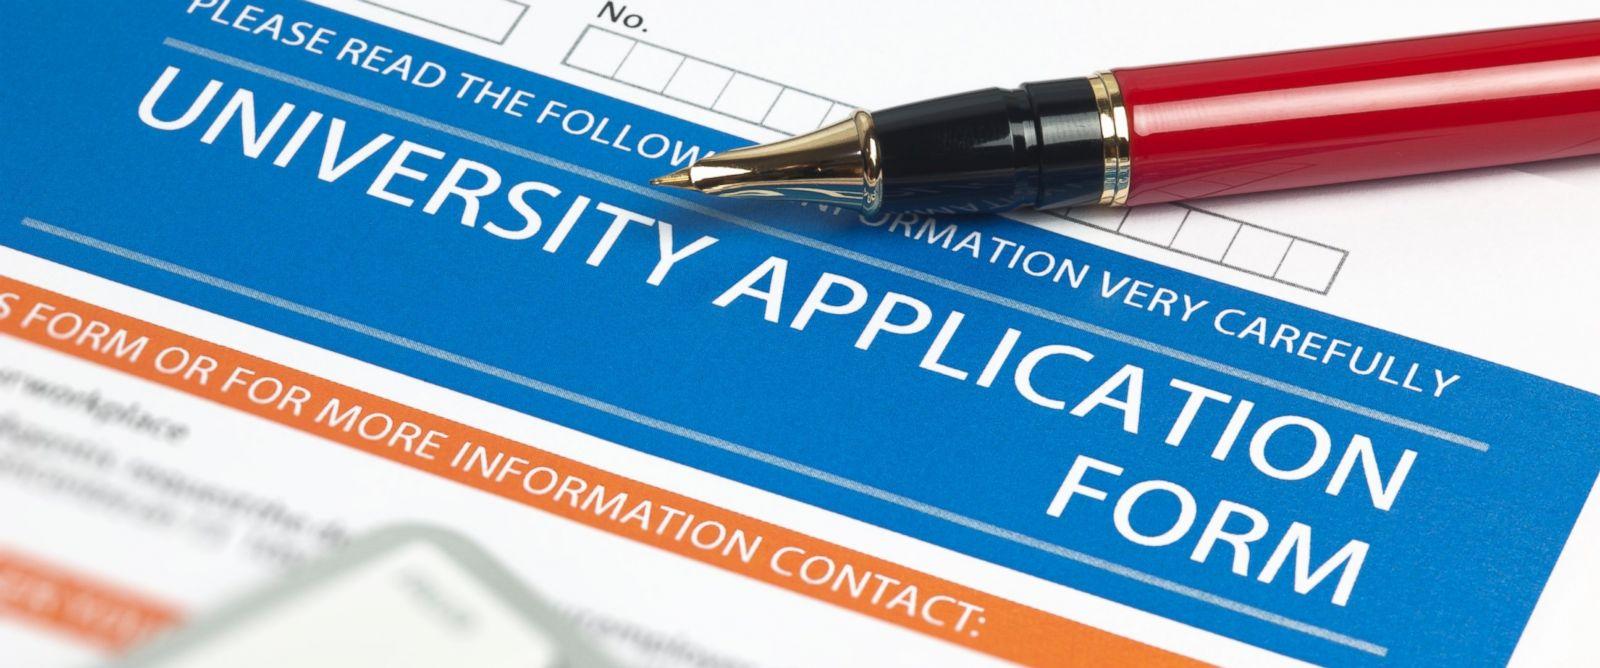 GTY_college_applications_mm_160120_12x5_1600 Victory University Application Form on grambling state, malawi mzuzu, great zimbabwe,